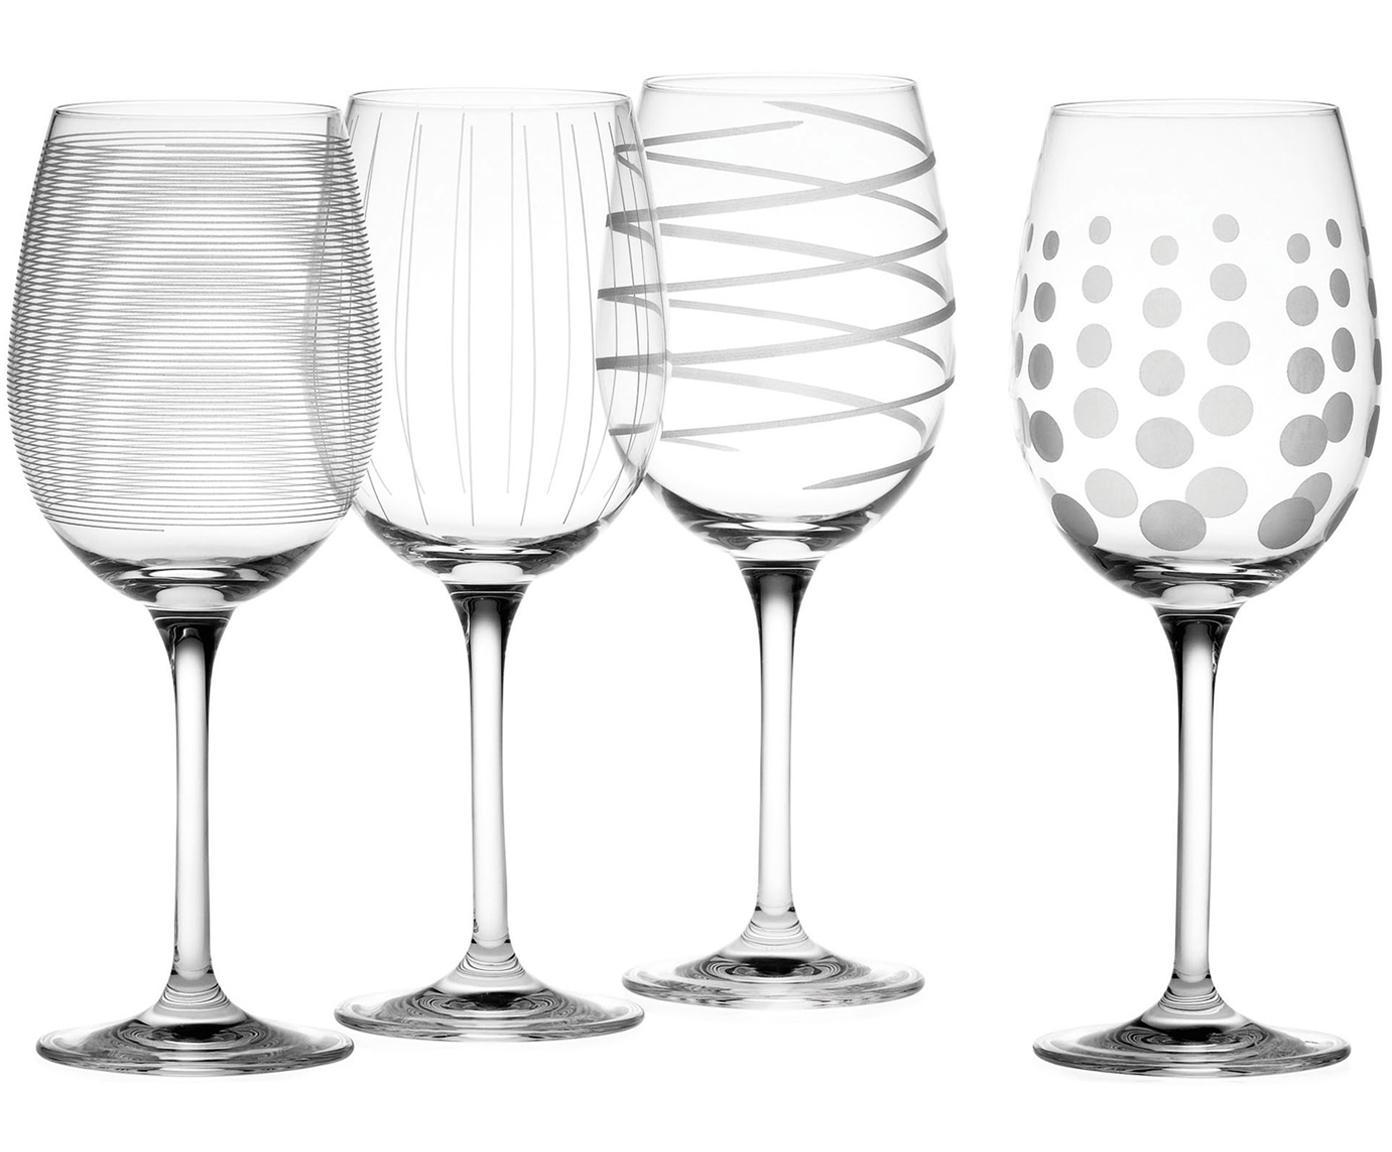 Copas de vino blanco Mikasa, 4uds., Vidrio, Transparente, plateado, Ø 9x Al 23 cm